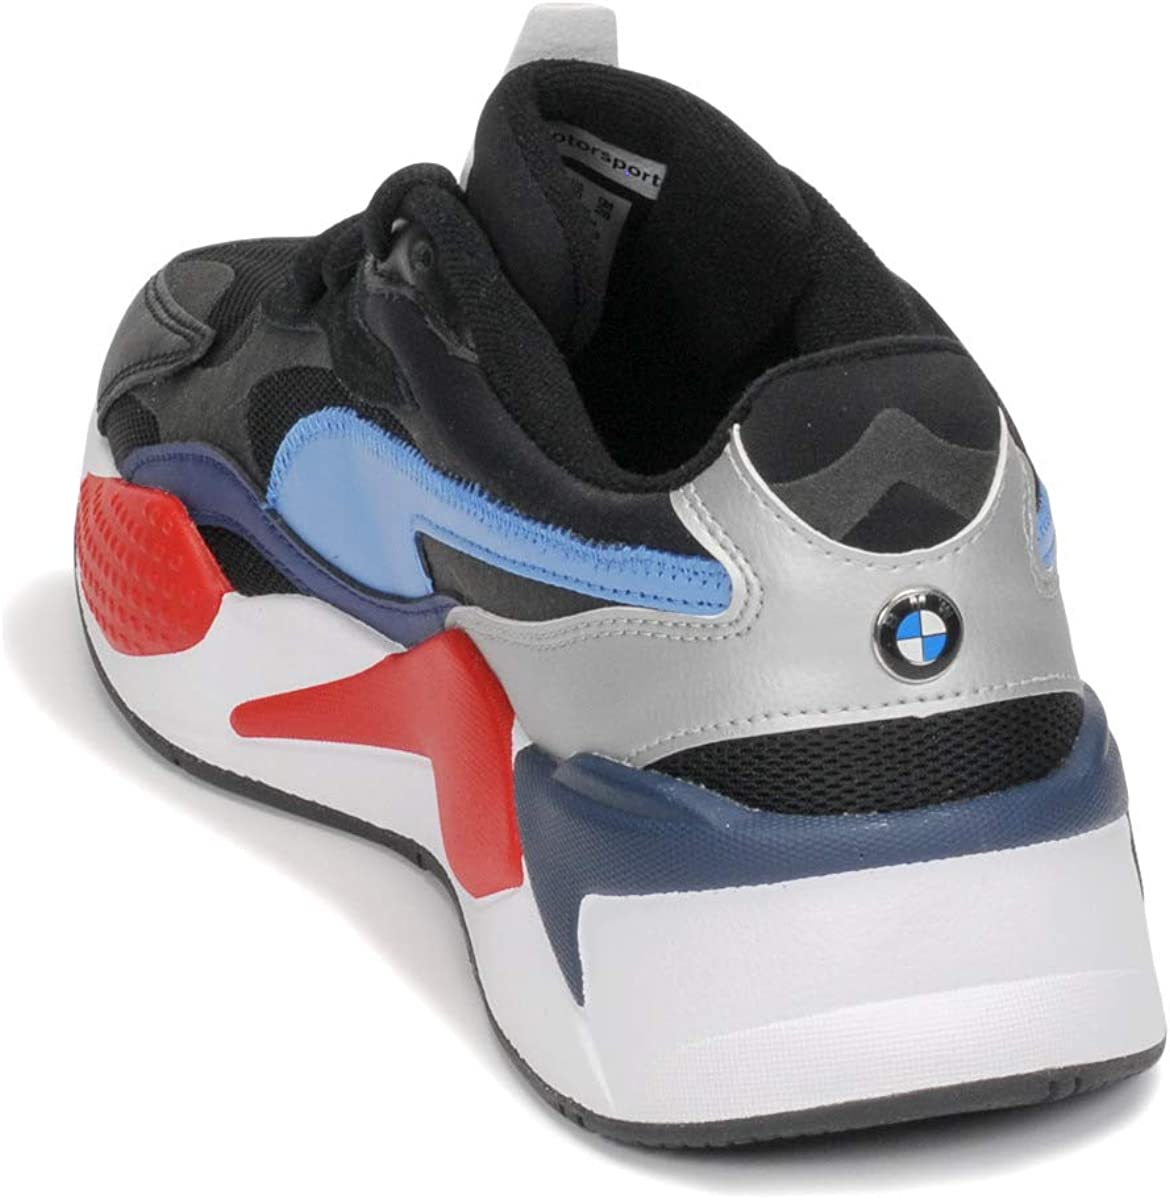 PUMA Rsx BMW Trainers Men Black